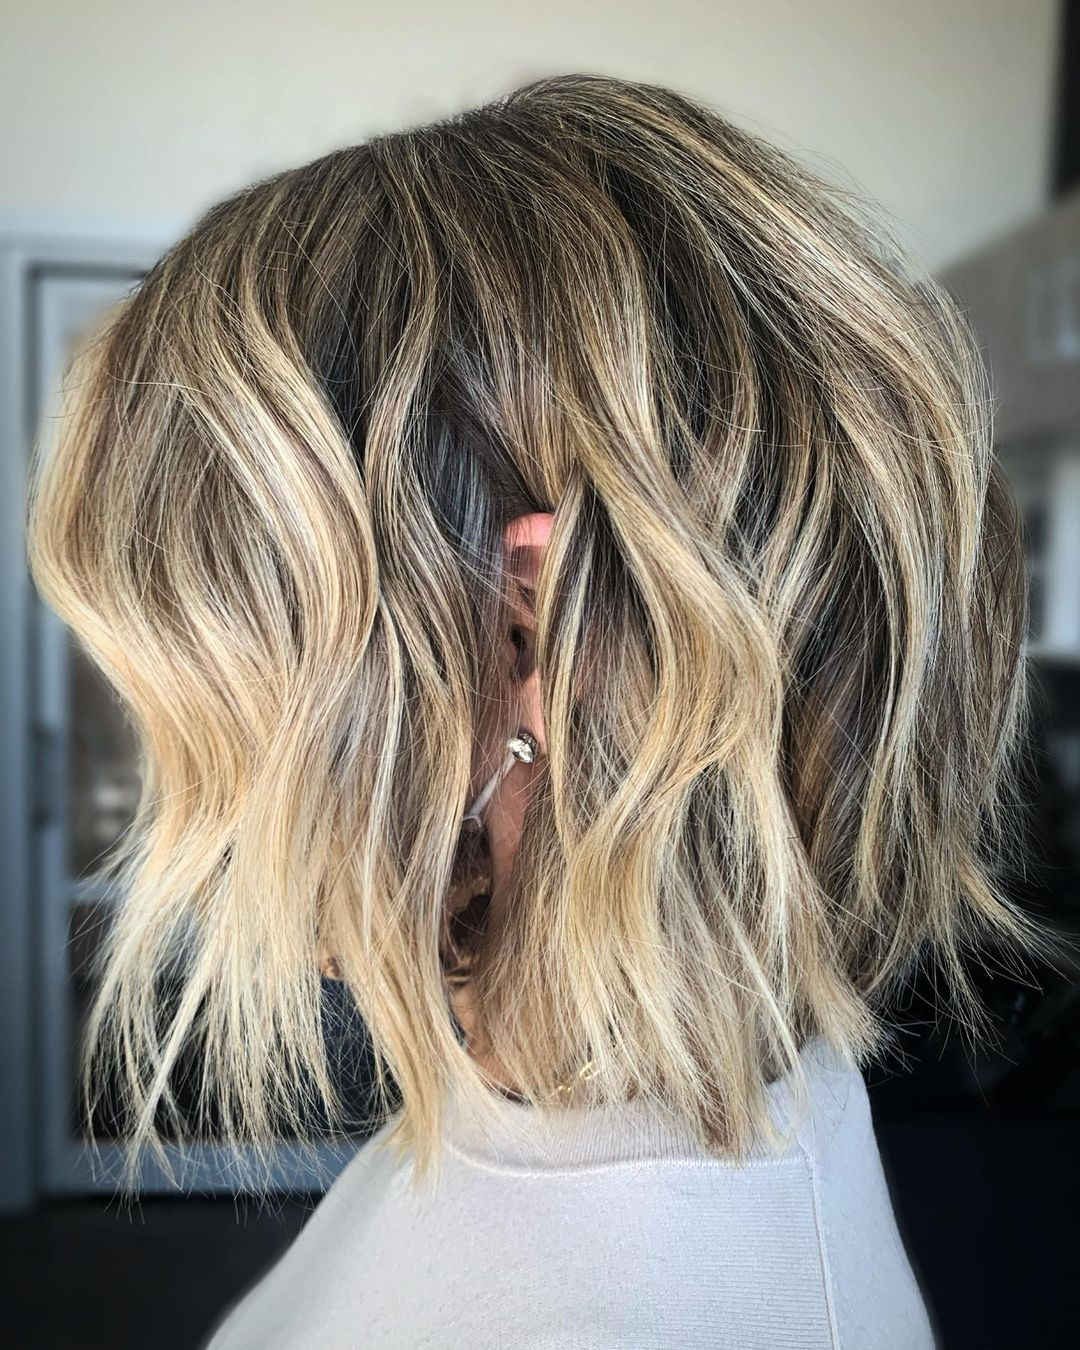 Blonde Balayage for Short Dark Hair